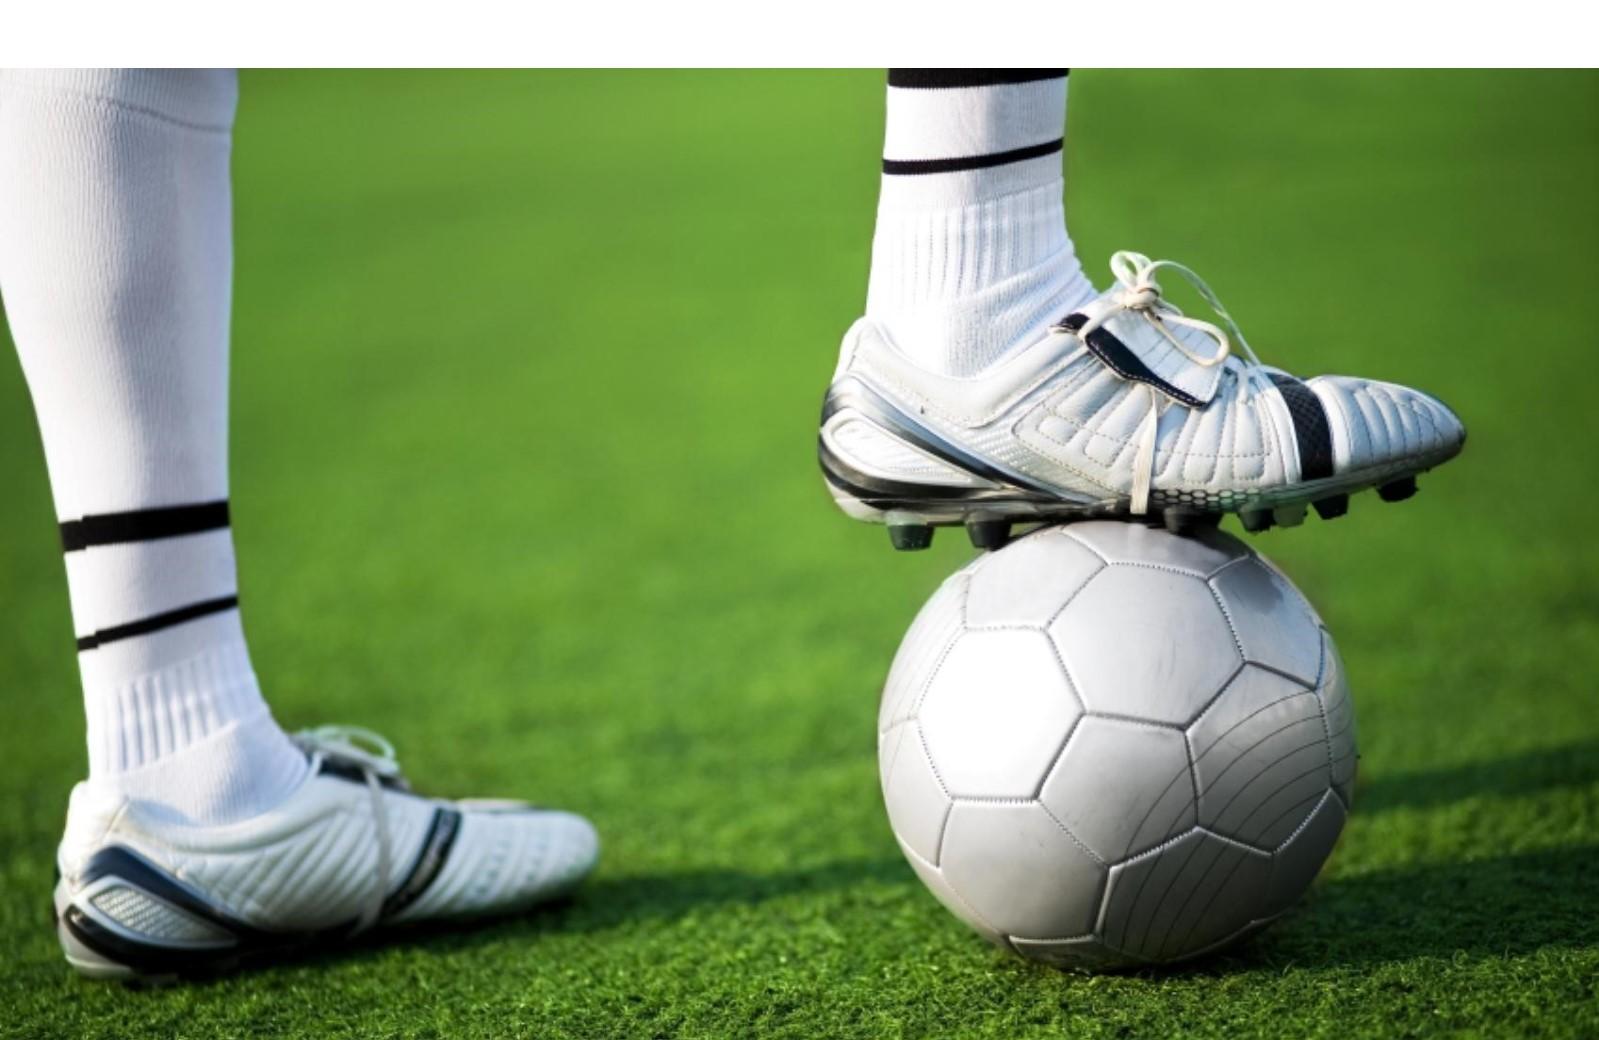 Fußballschuh, Fußball